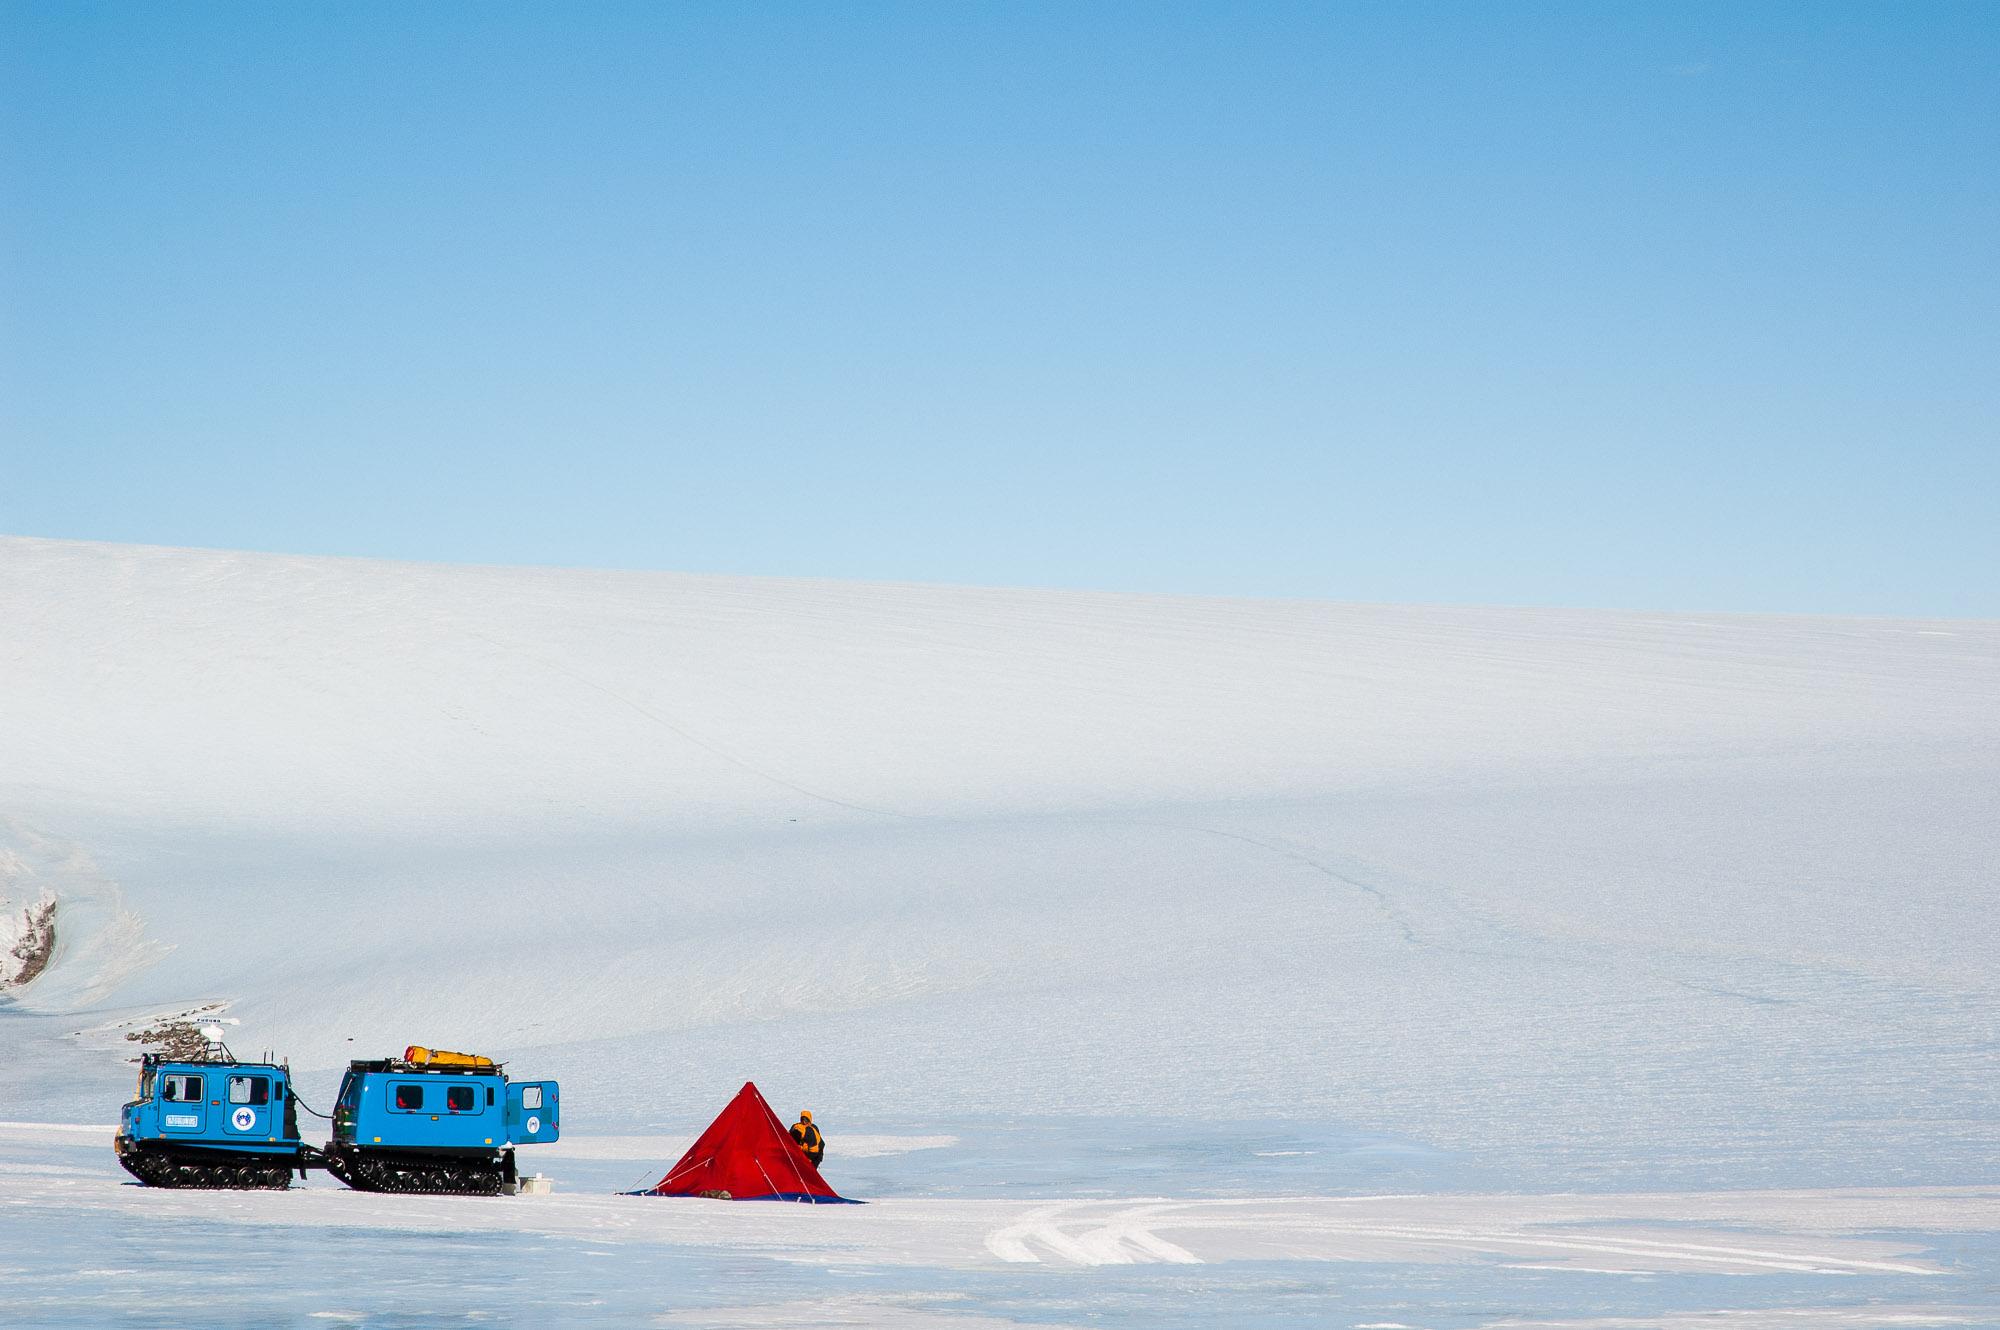 Polar pyramid tent at camp site below Mt Burnett, South Masson Range, Framnes Mountains, Mac Robertson Land, Antarctica.